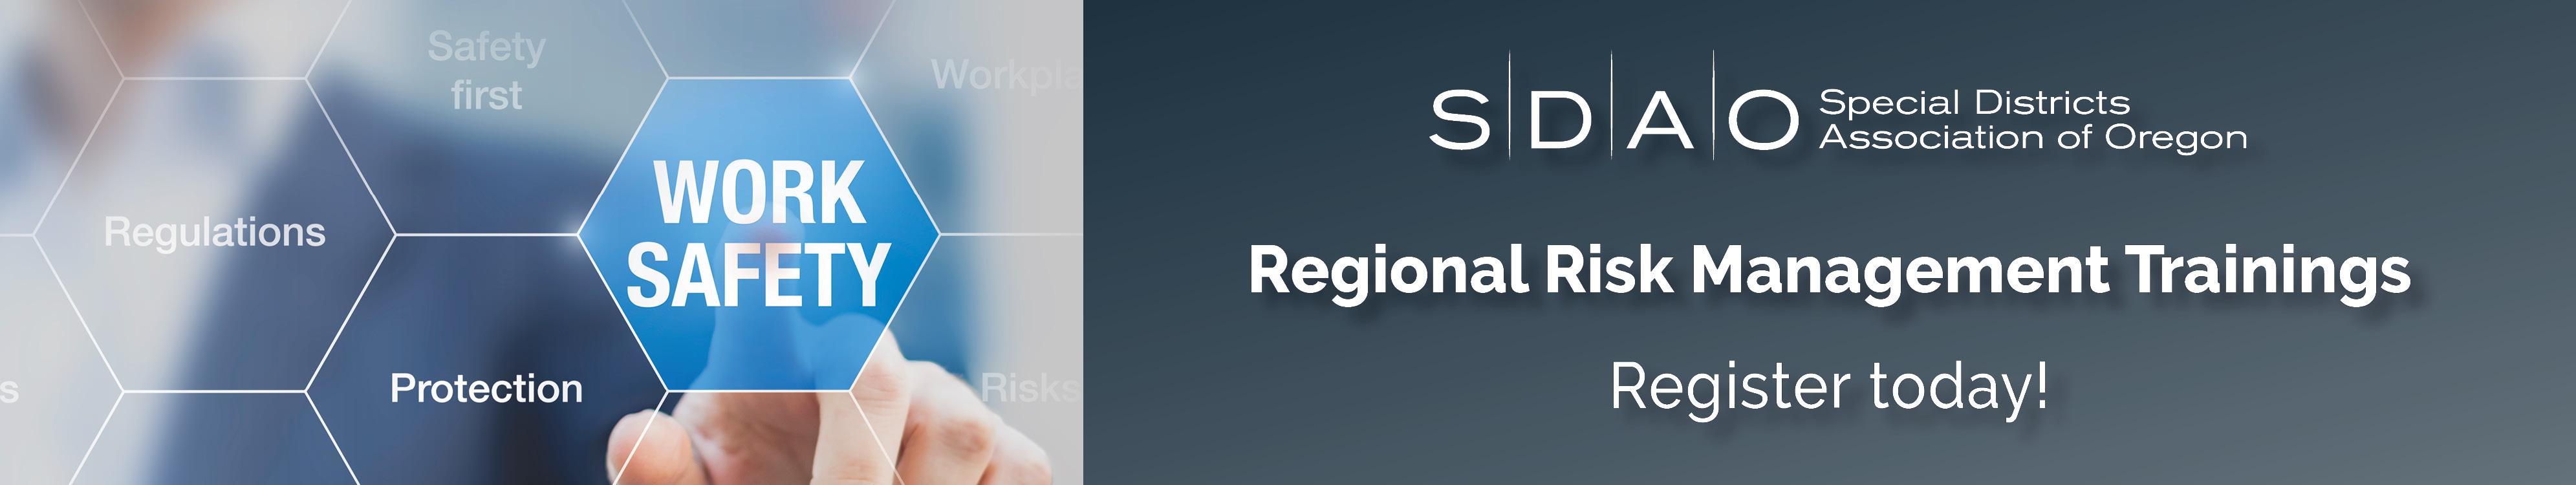 Regional Risk Management Training